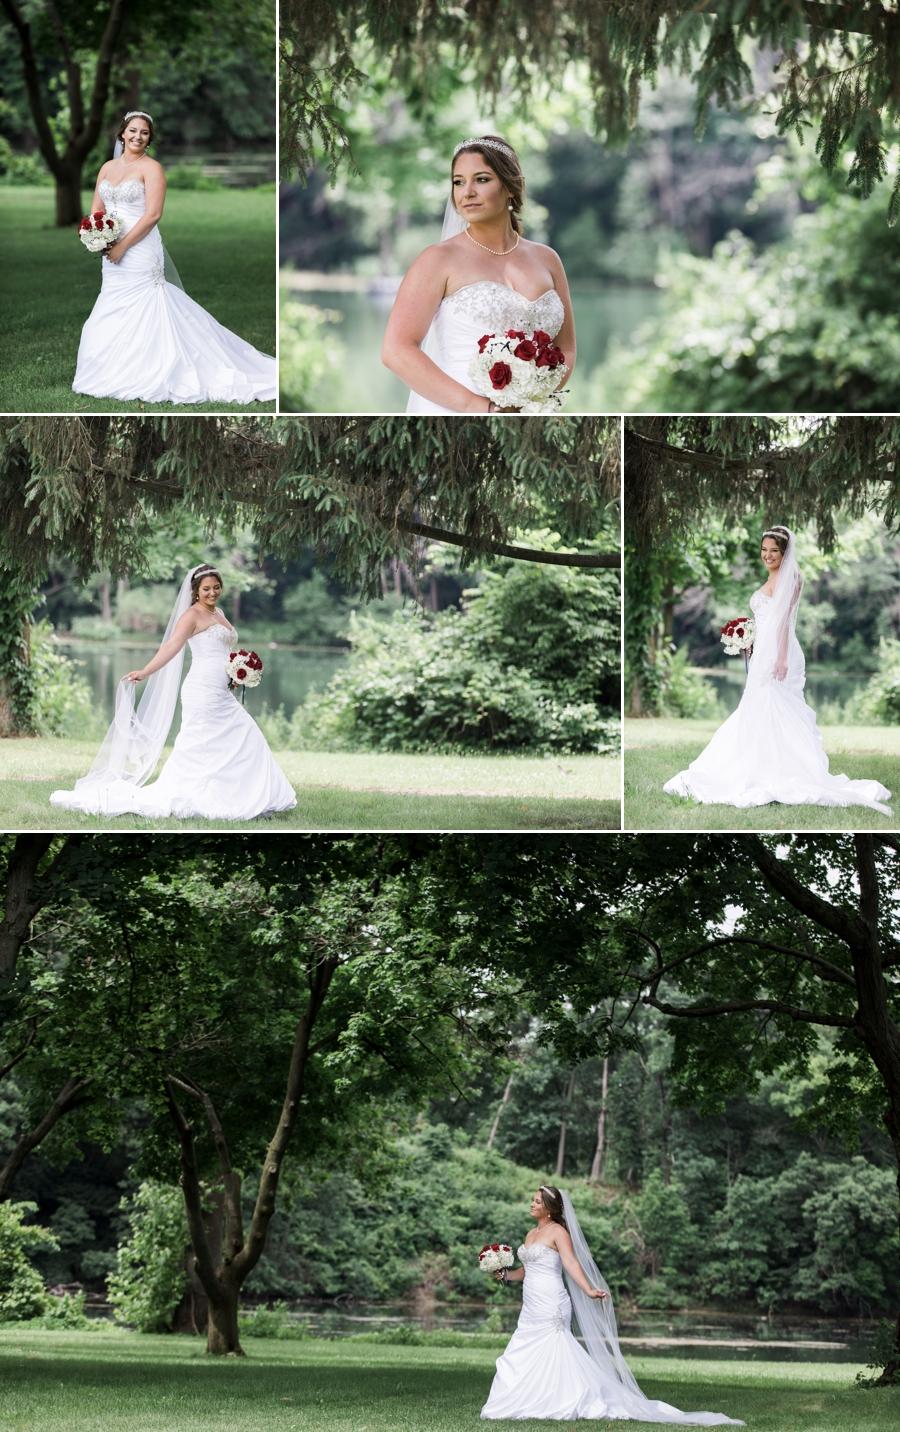 South Bend Wedding 3.jpg